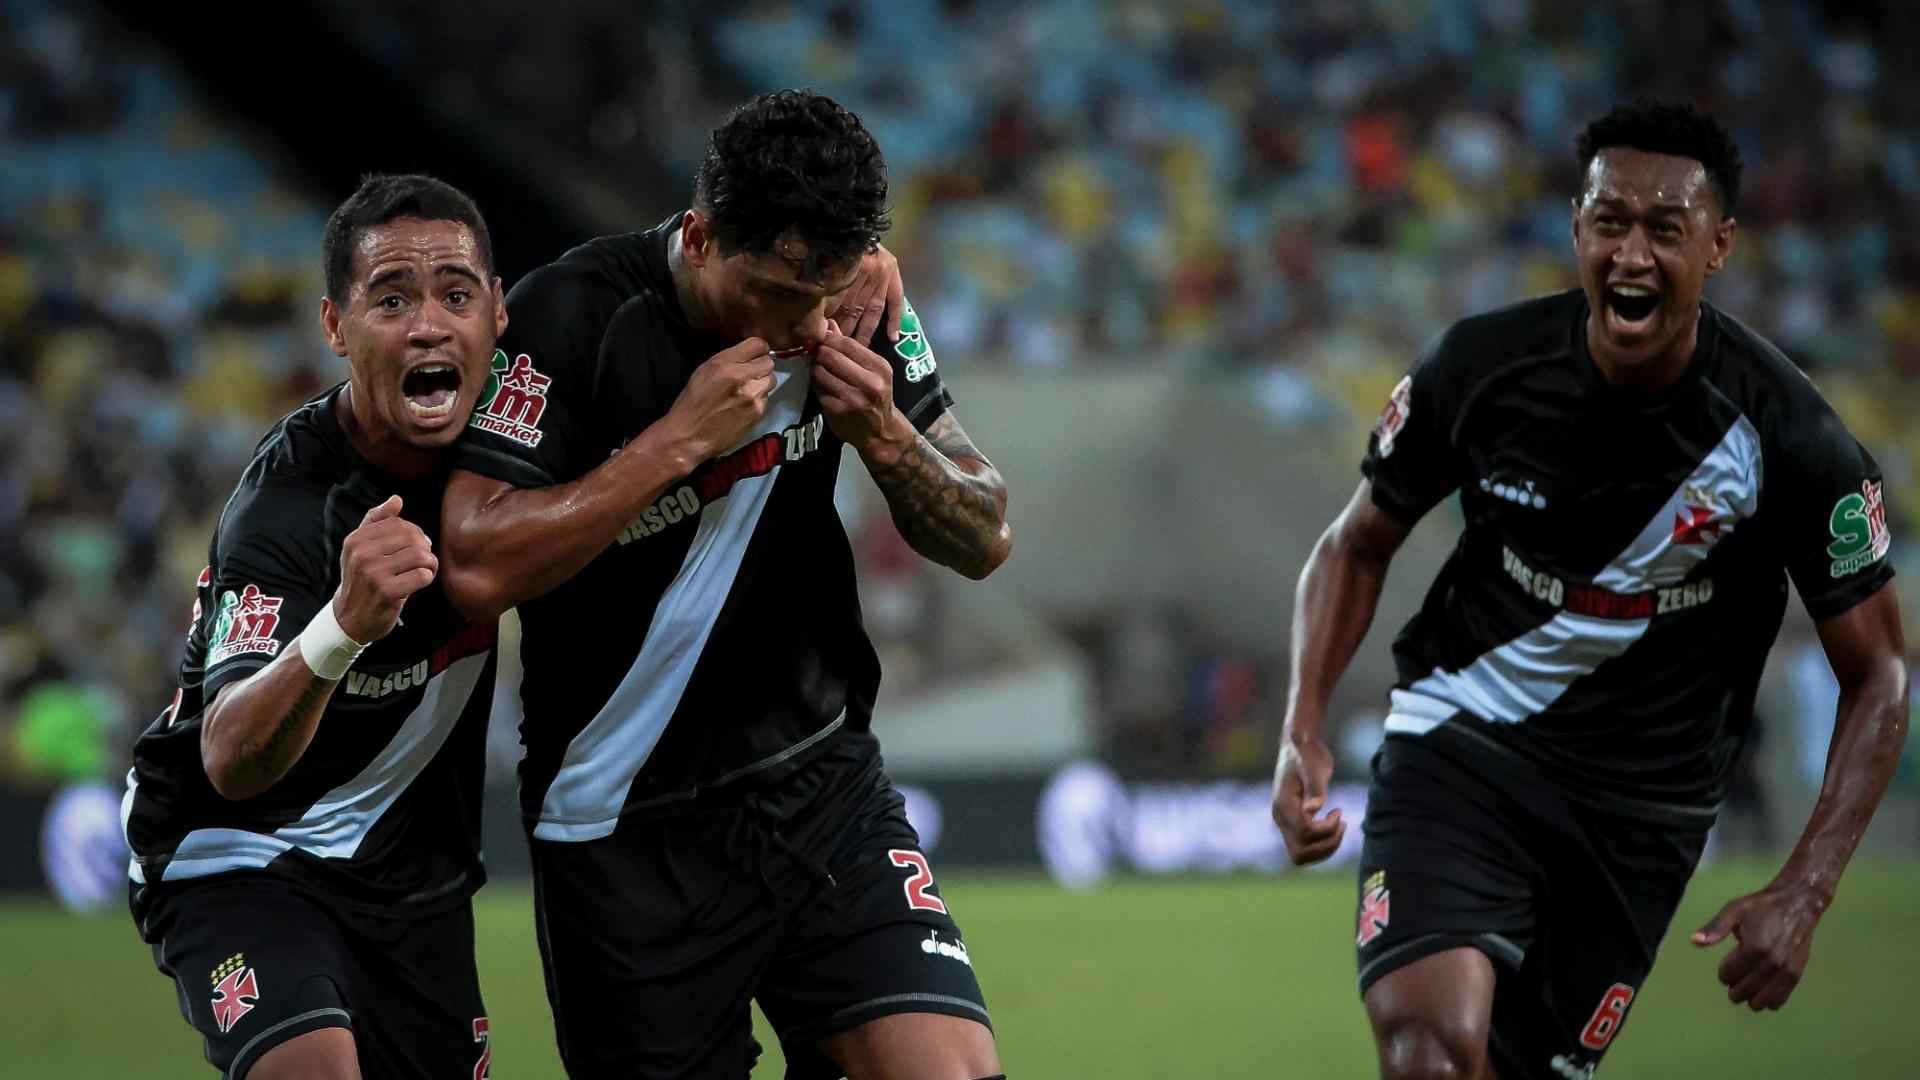 Jogadores do Vasco comemoram gol de Giovanni Augusto contra o Fluminense pelo Campeonato Carioca